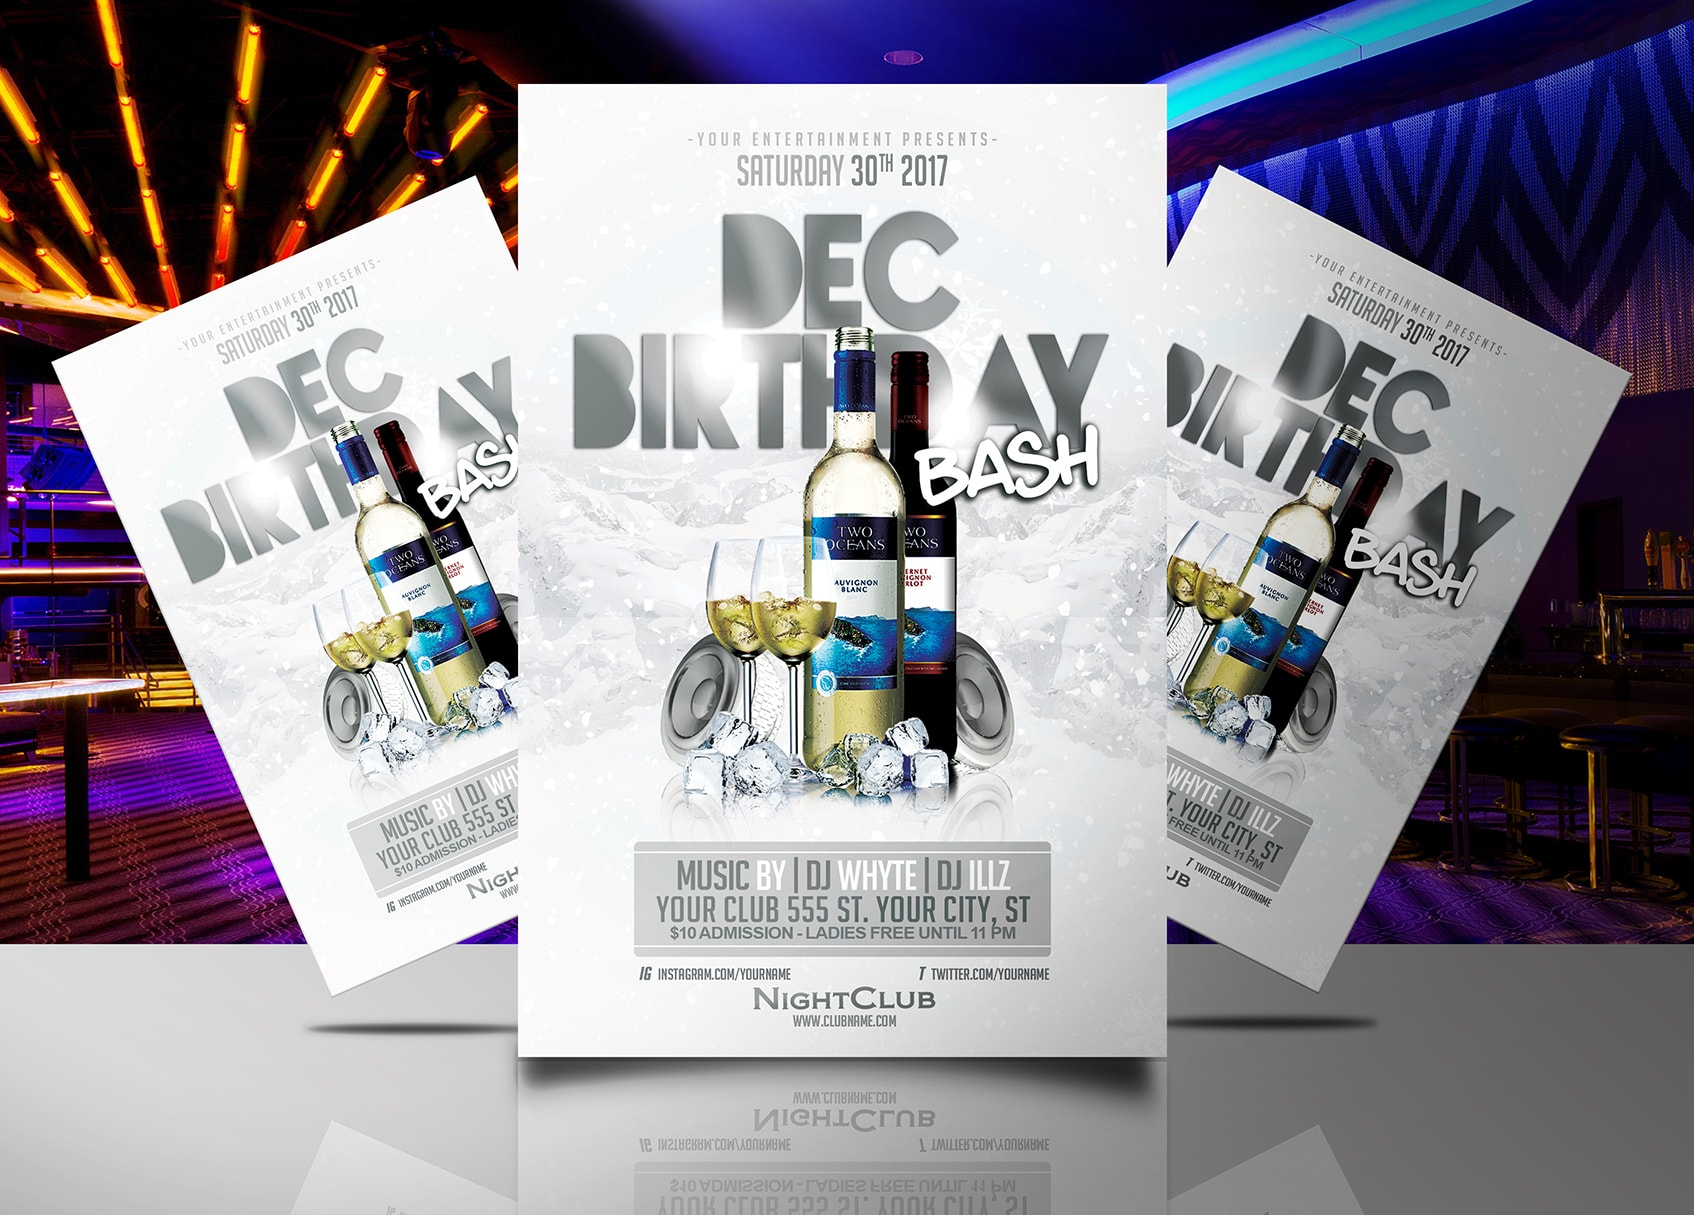 december birthday bash flyer template streetz myestro beats